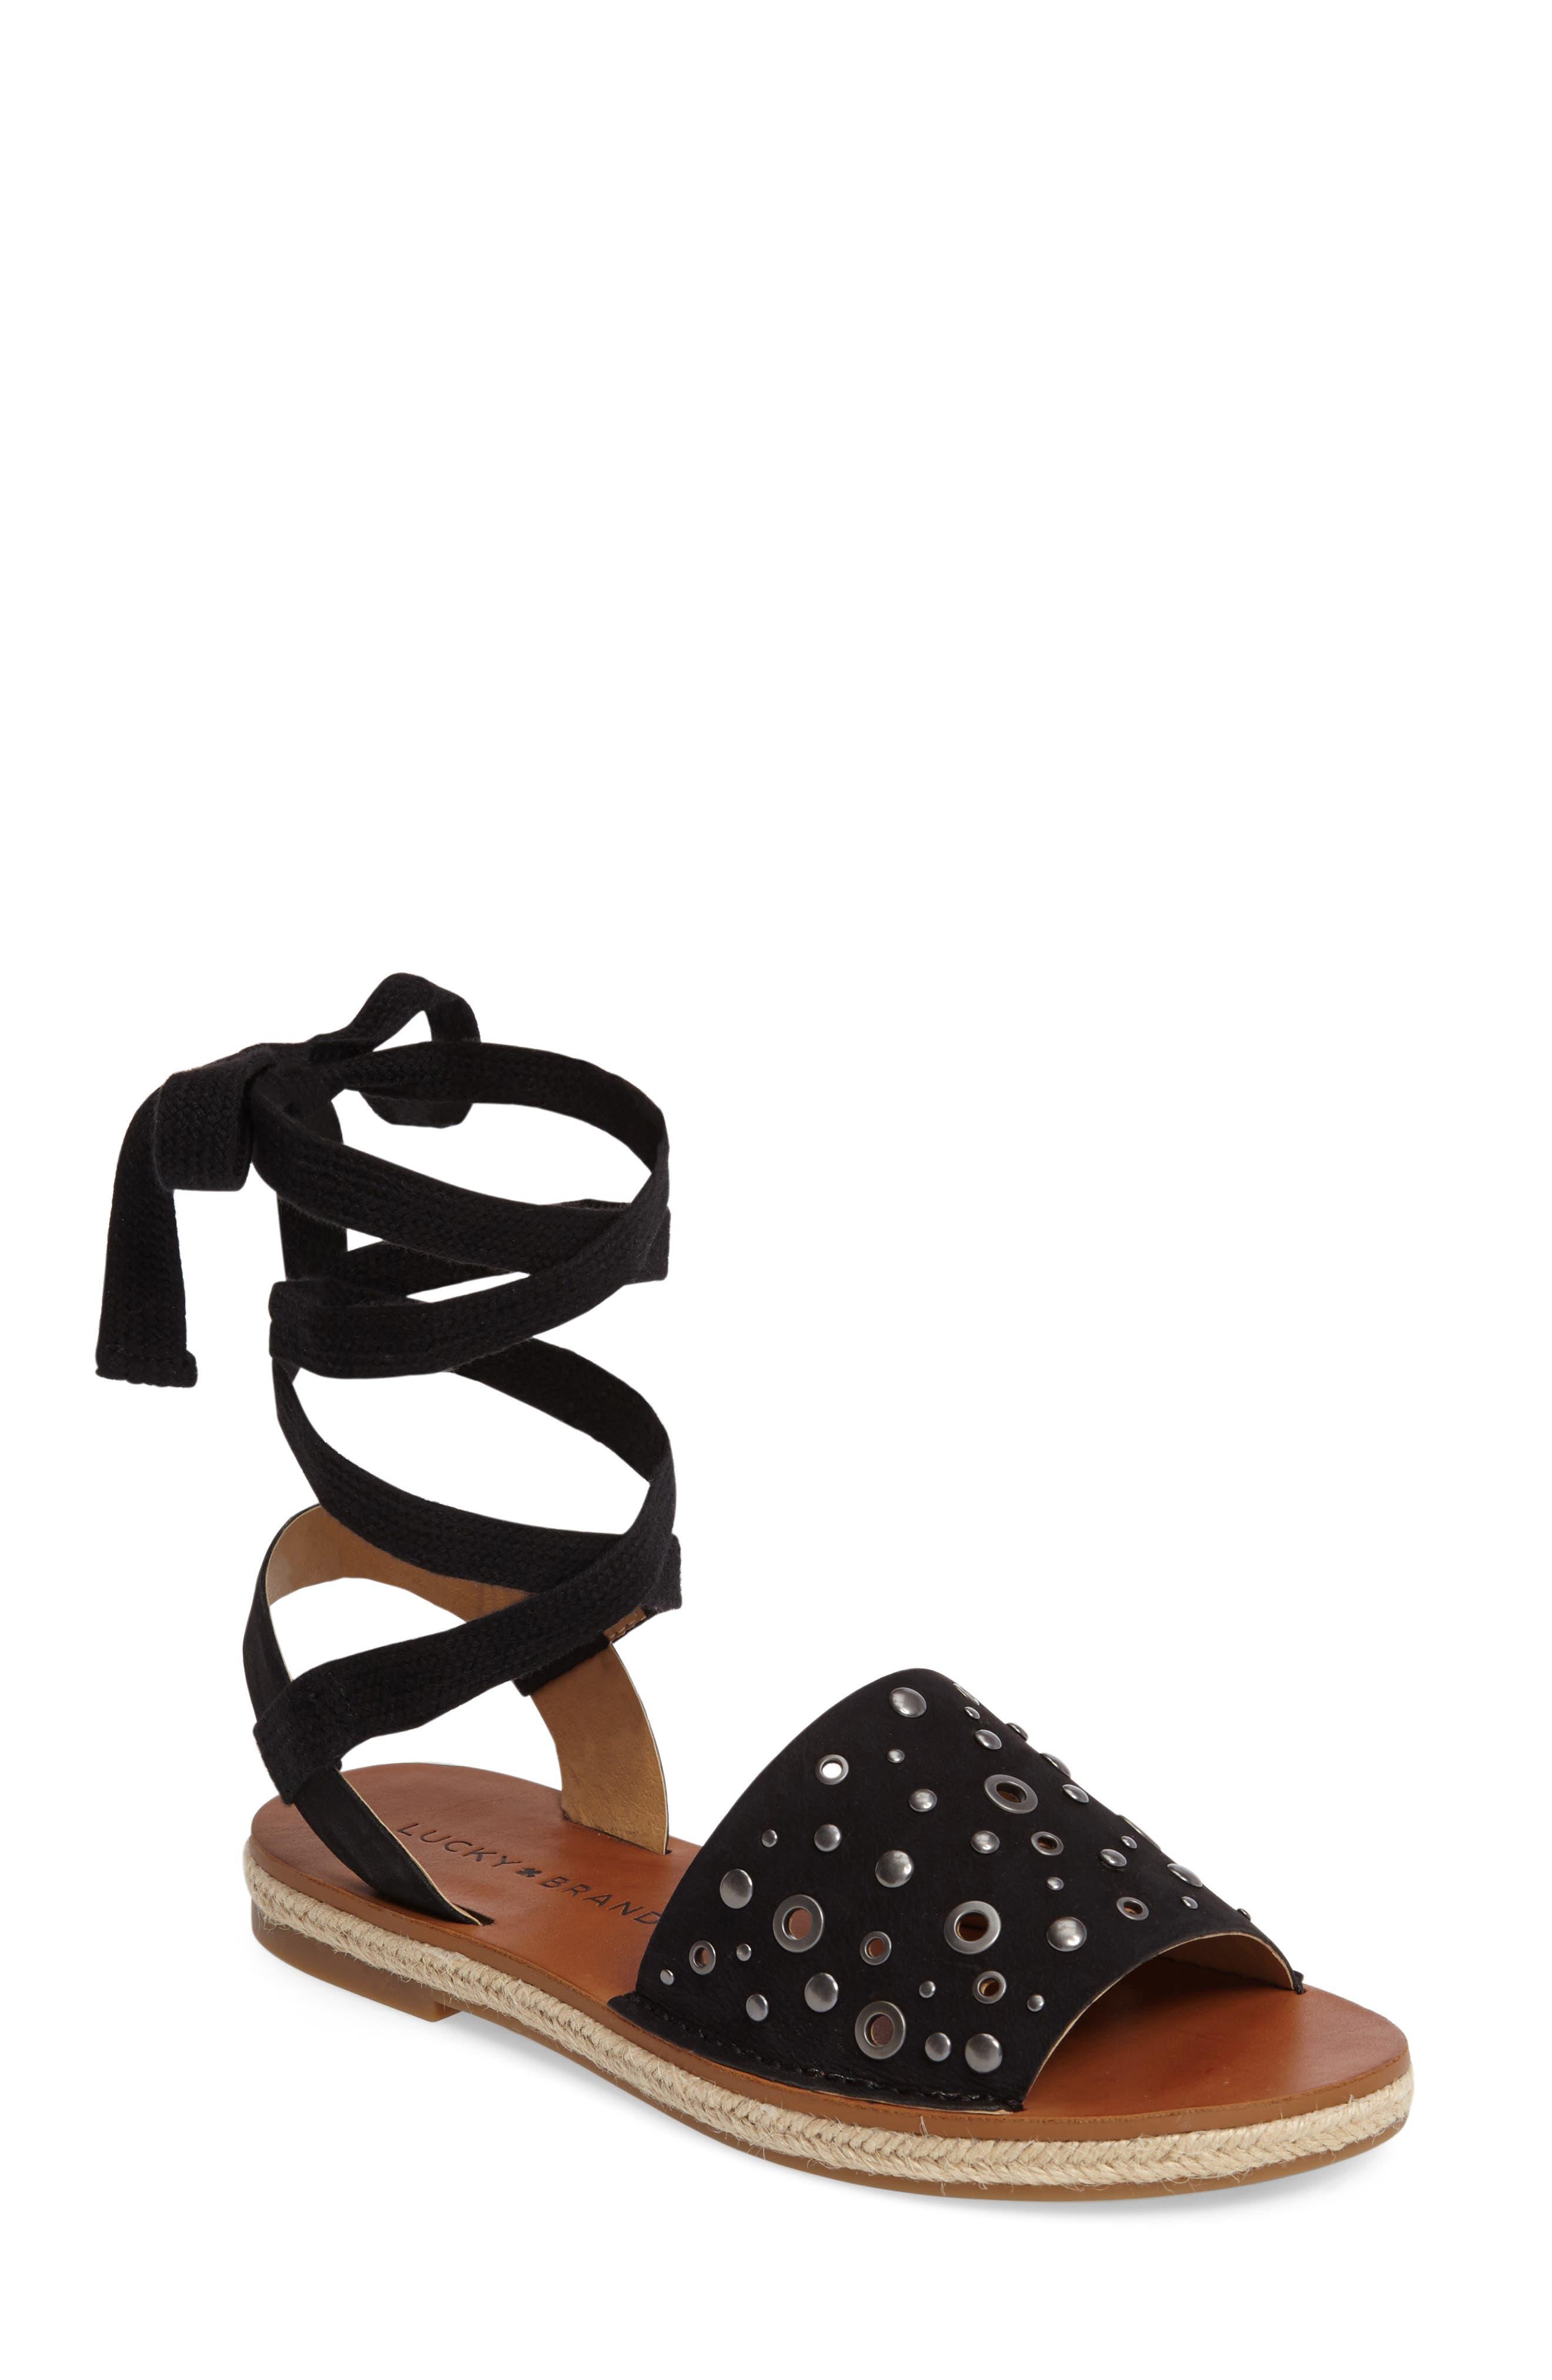 Daytah Ankle Tie Sandal,                         Main,                         color,